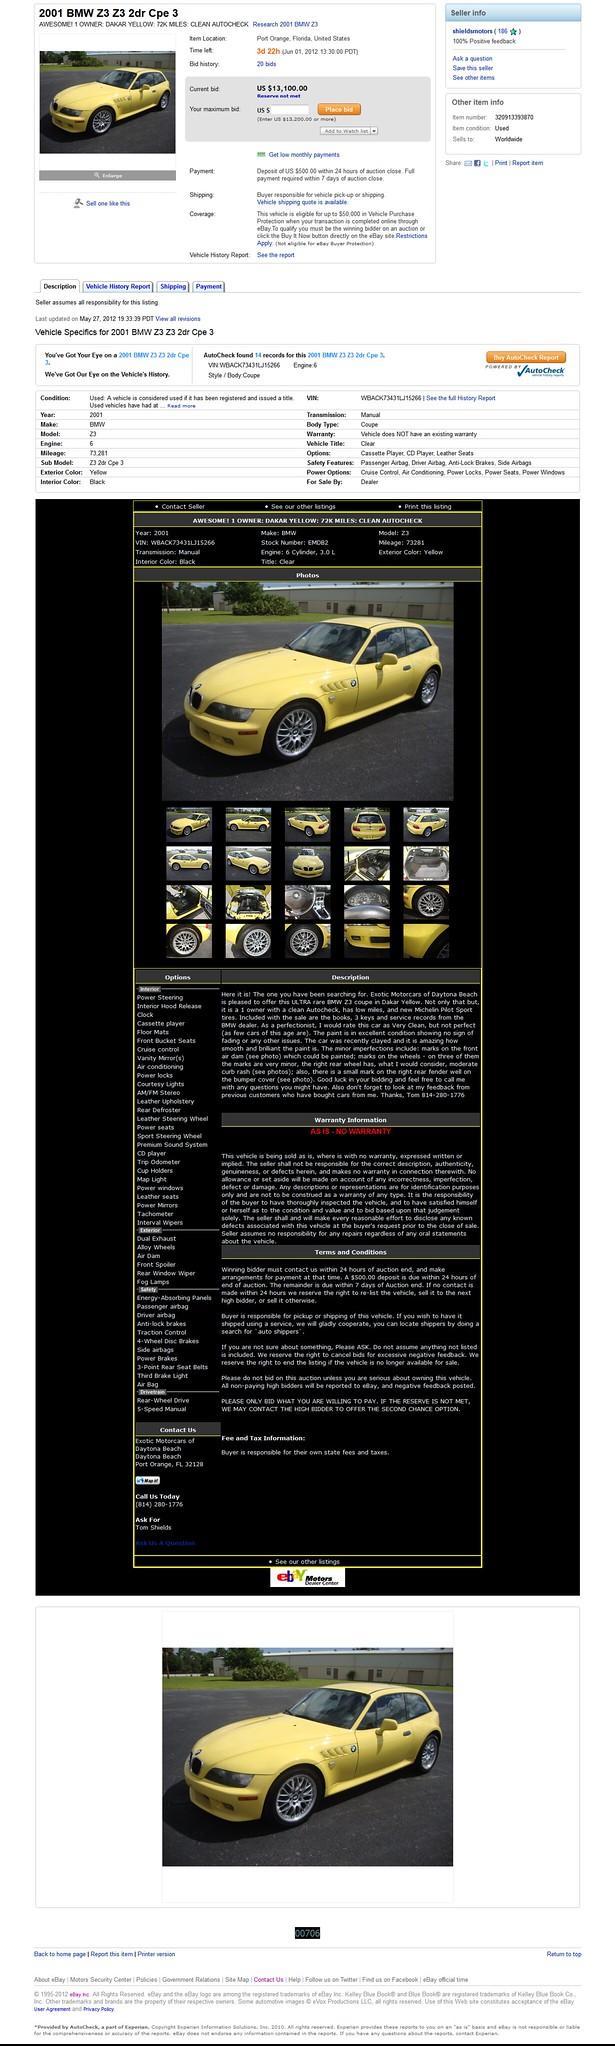 2001 Z3 Coupe | Dakar Yellow | Black | VIN WBACK73431LJ15266 | eBay Ad Screenshot | Item # 320913393870 | shieldsmotors